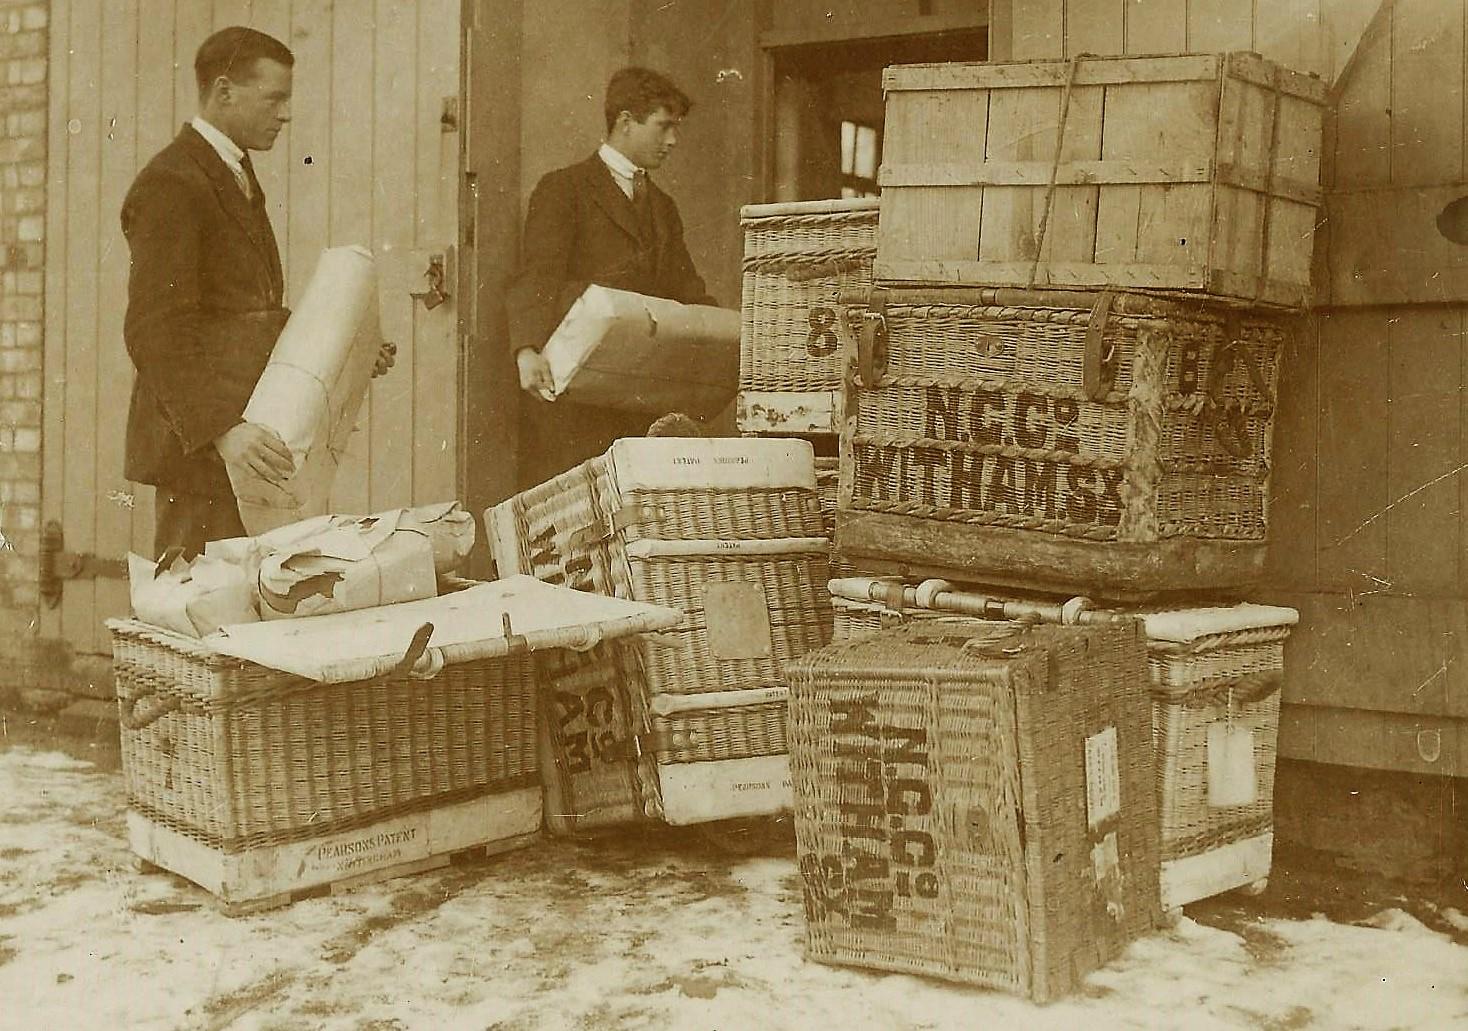 1923 Unloading fabric